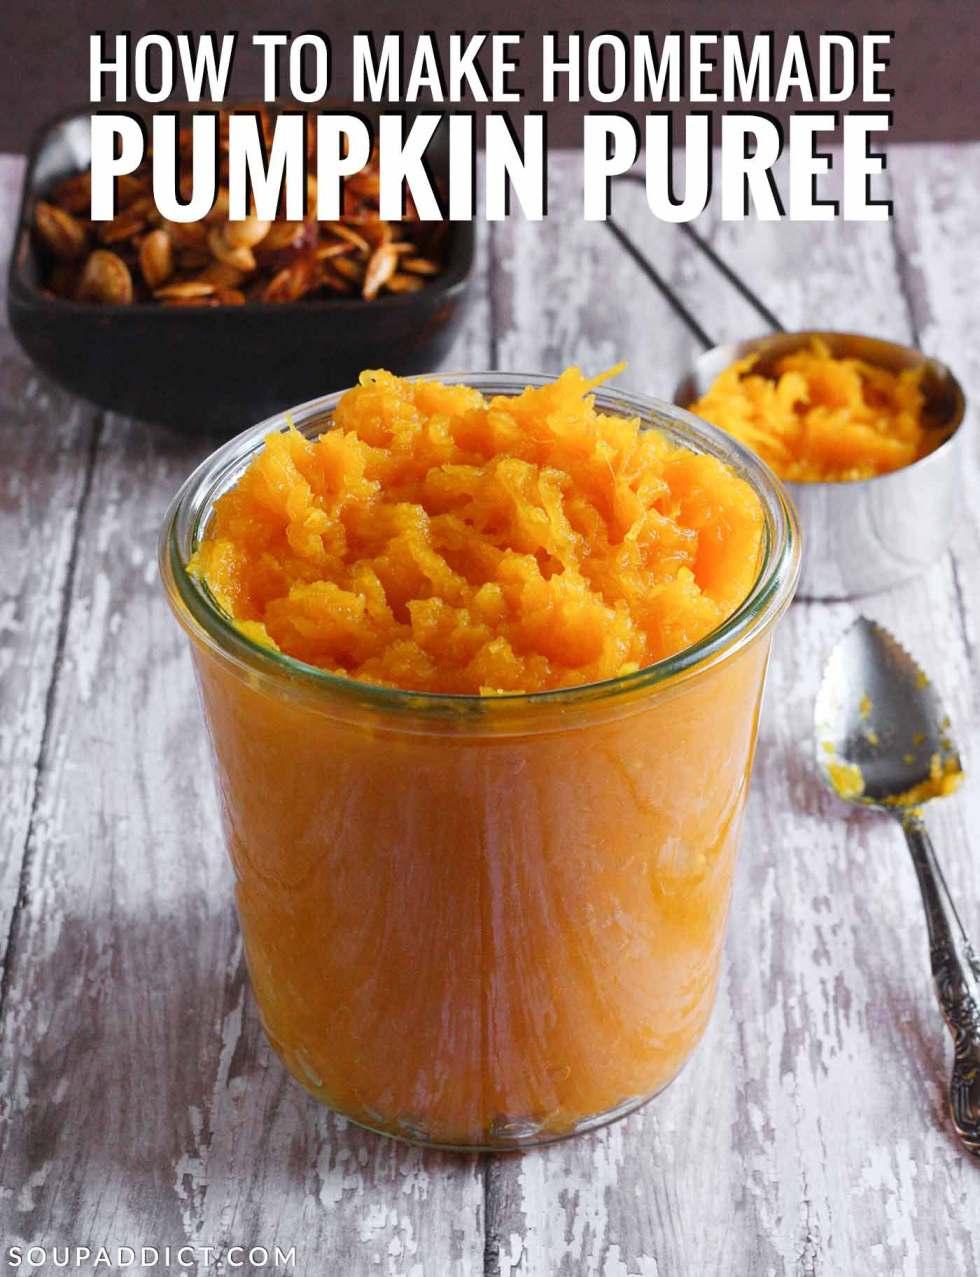 How to make pumpkin puree - Recipe at SoupAddict.com | #pumpkinpuree #homemade